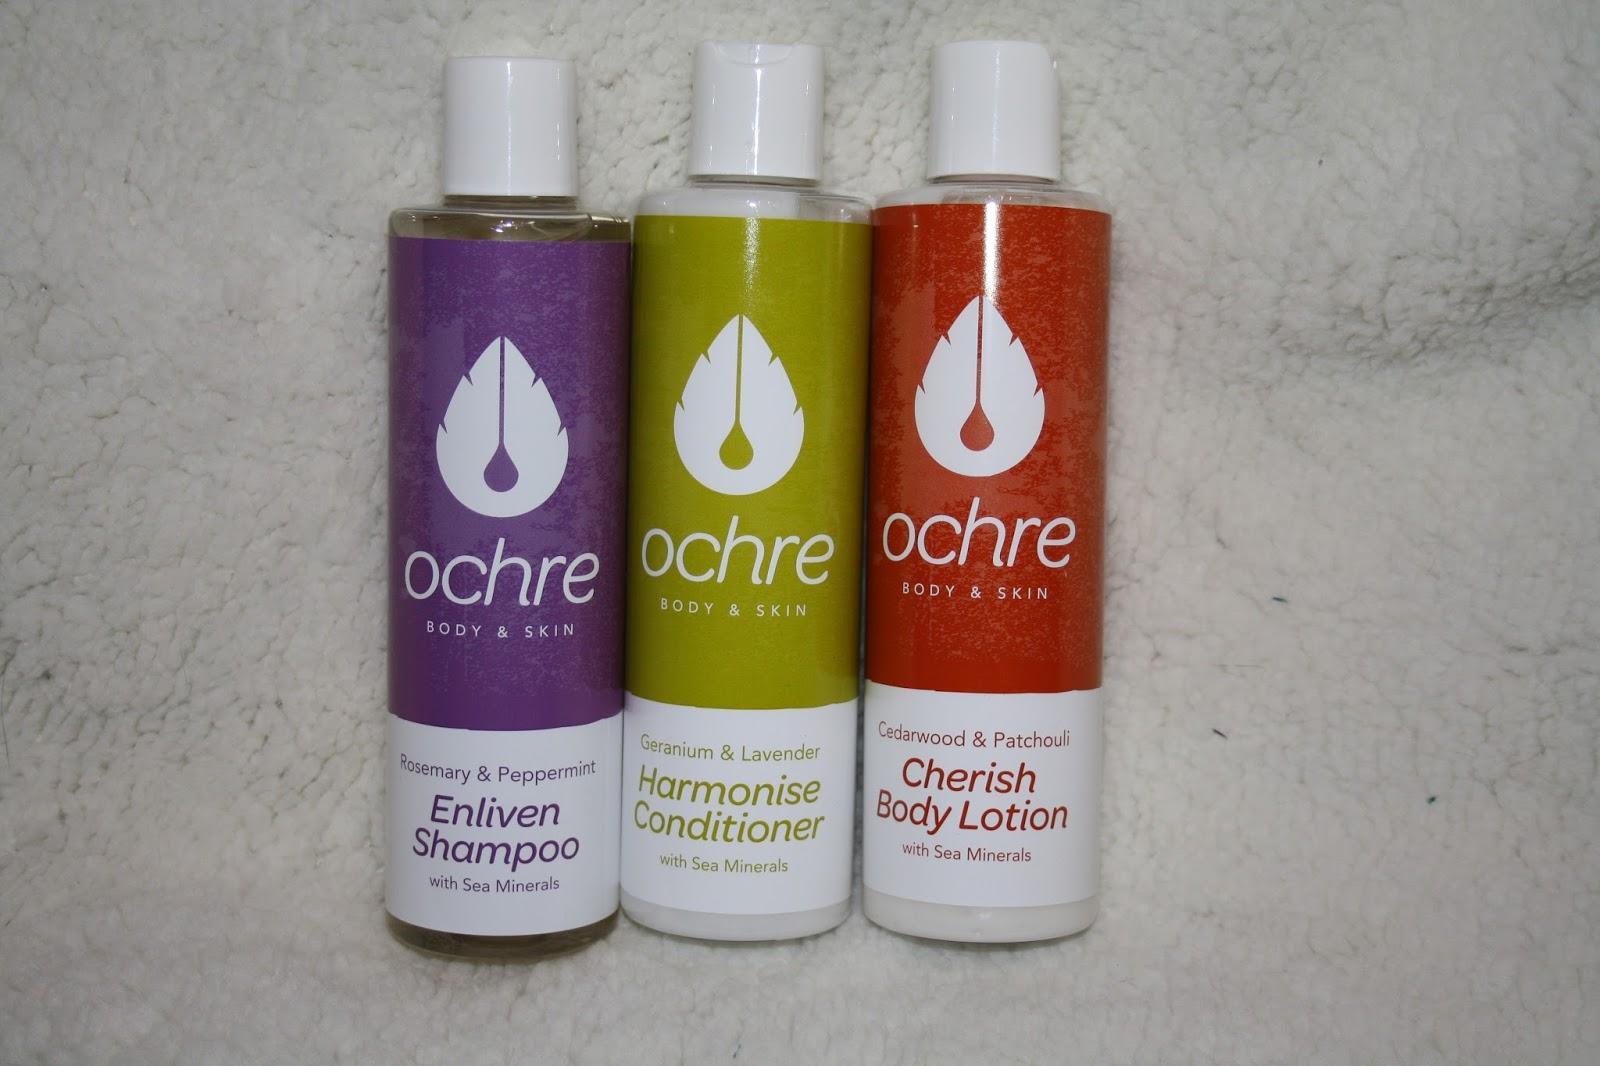 Ochre Body and Skincare Range